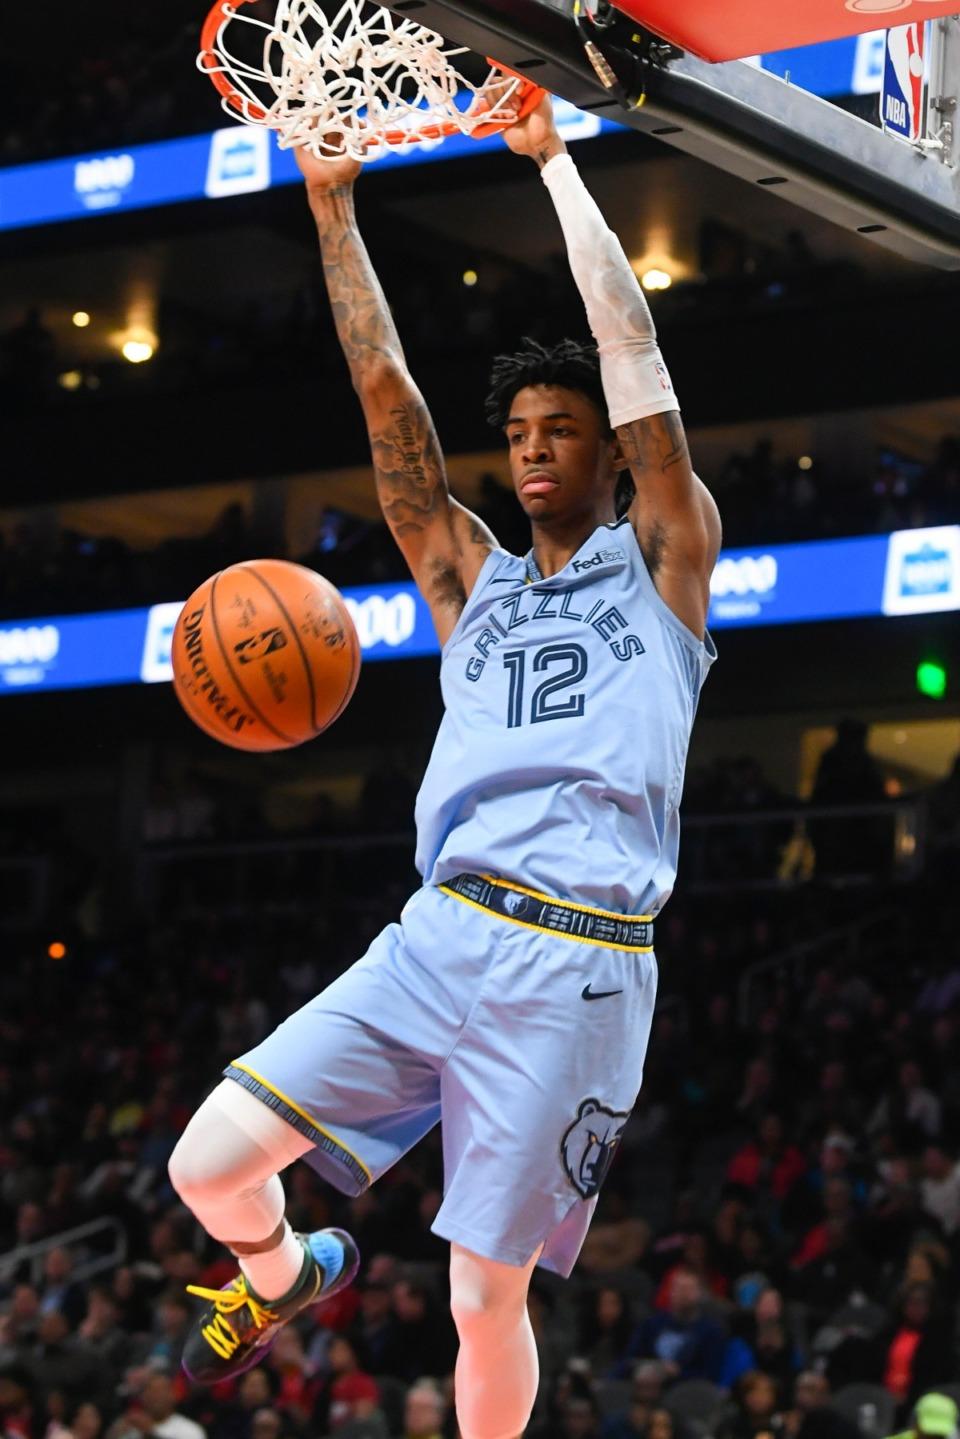 <strong>Memphis Grizzlies guard Ja Morant (12) dunks in the game against the Atlanta Hawks March 2, 2020, in Atlanta.</strong>&nbsp;(John Amis/AP)